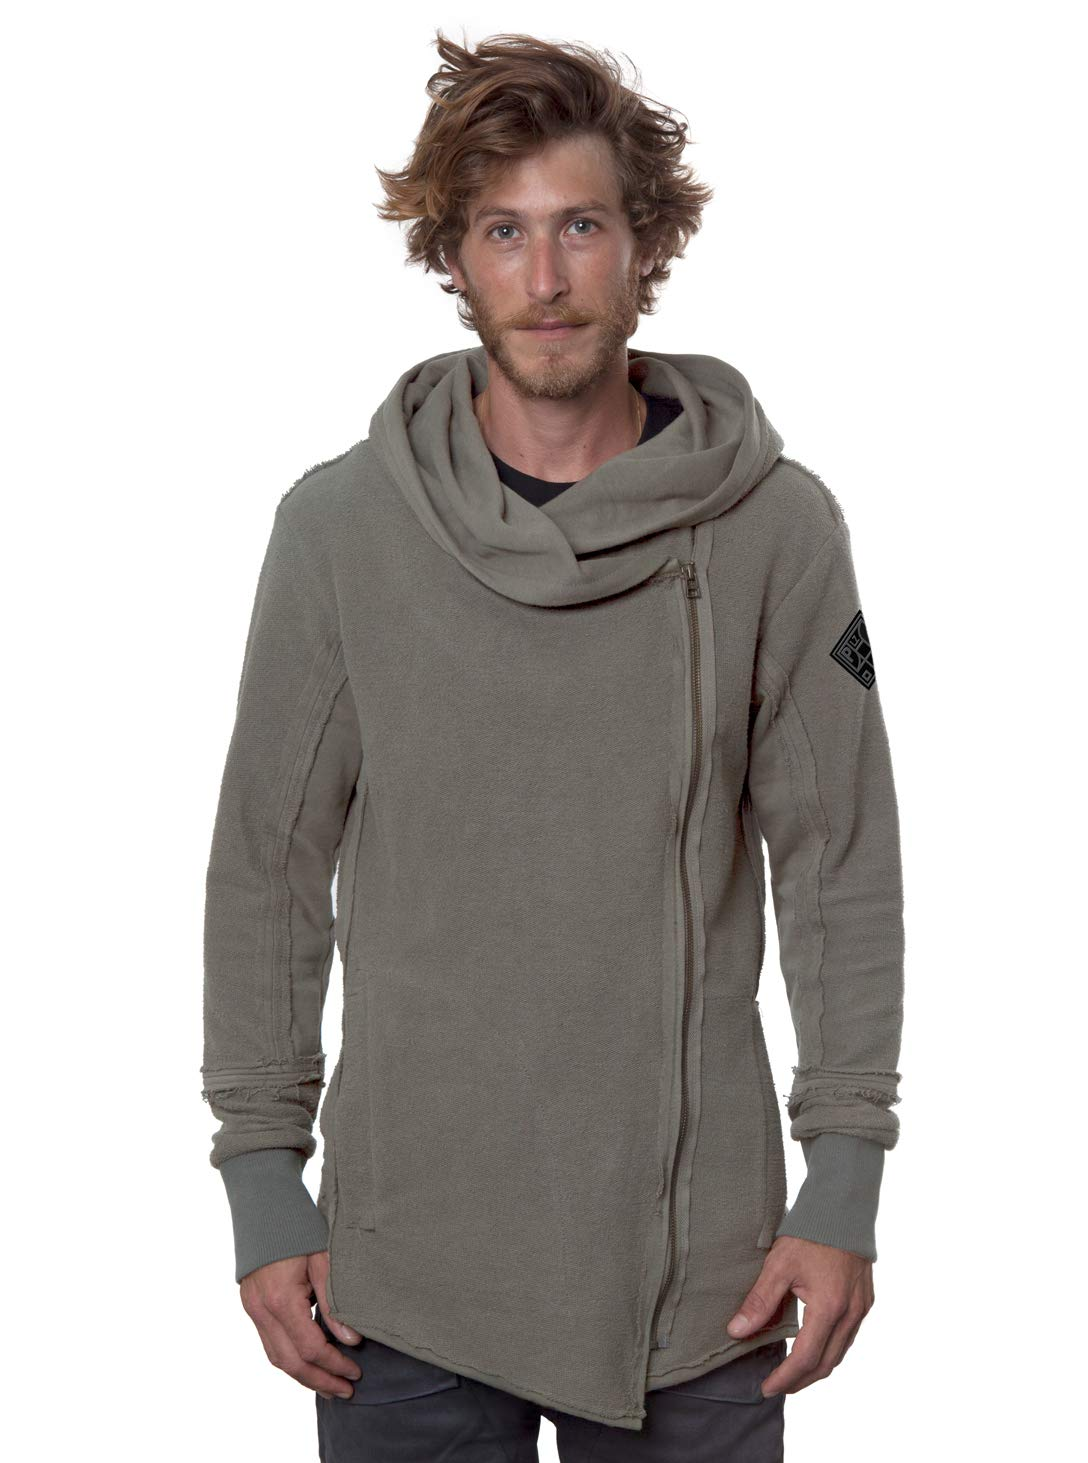 Men's Token Hooded Jacket Asymmetrical Side Zip Gray French Terry Cotton Outwear